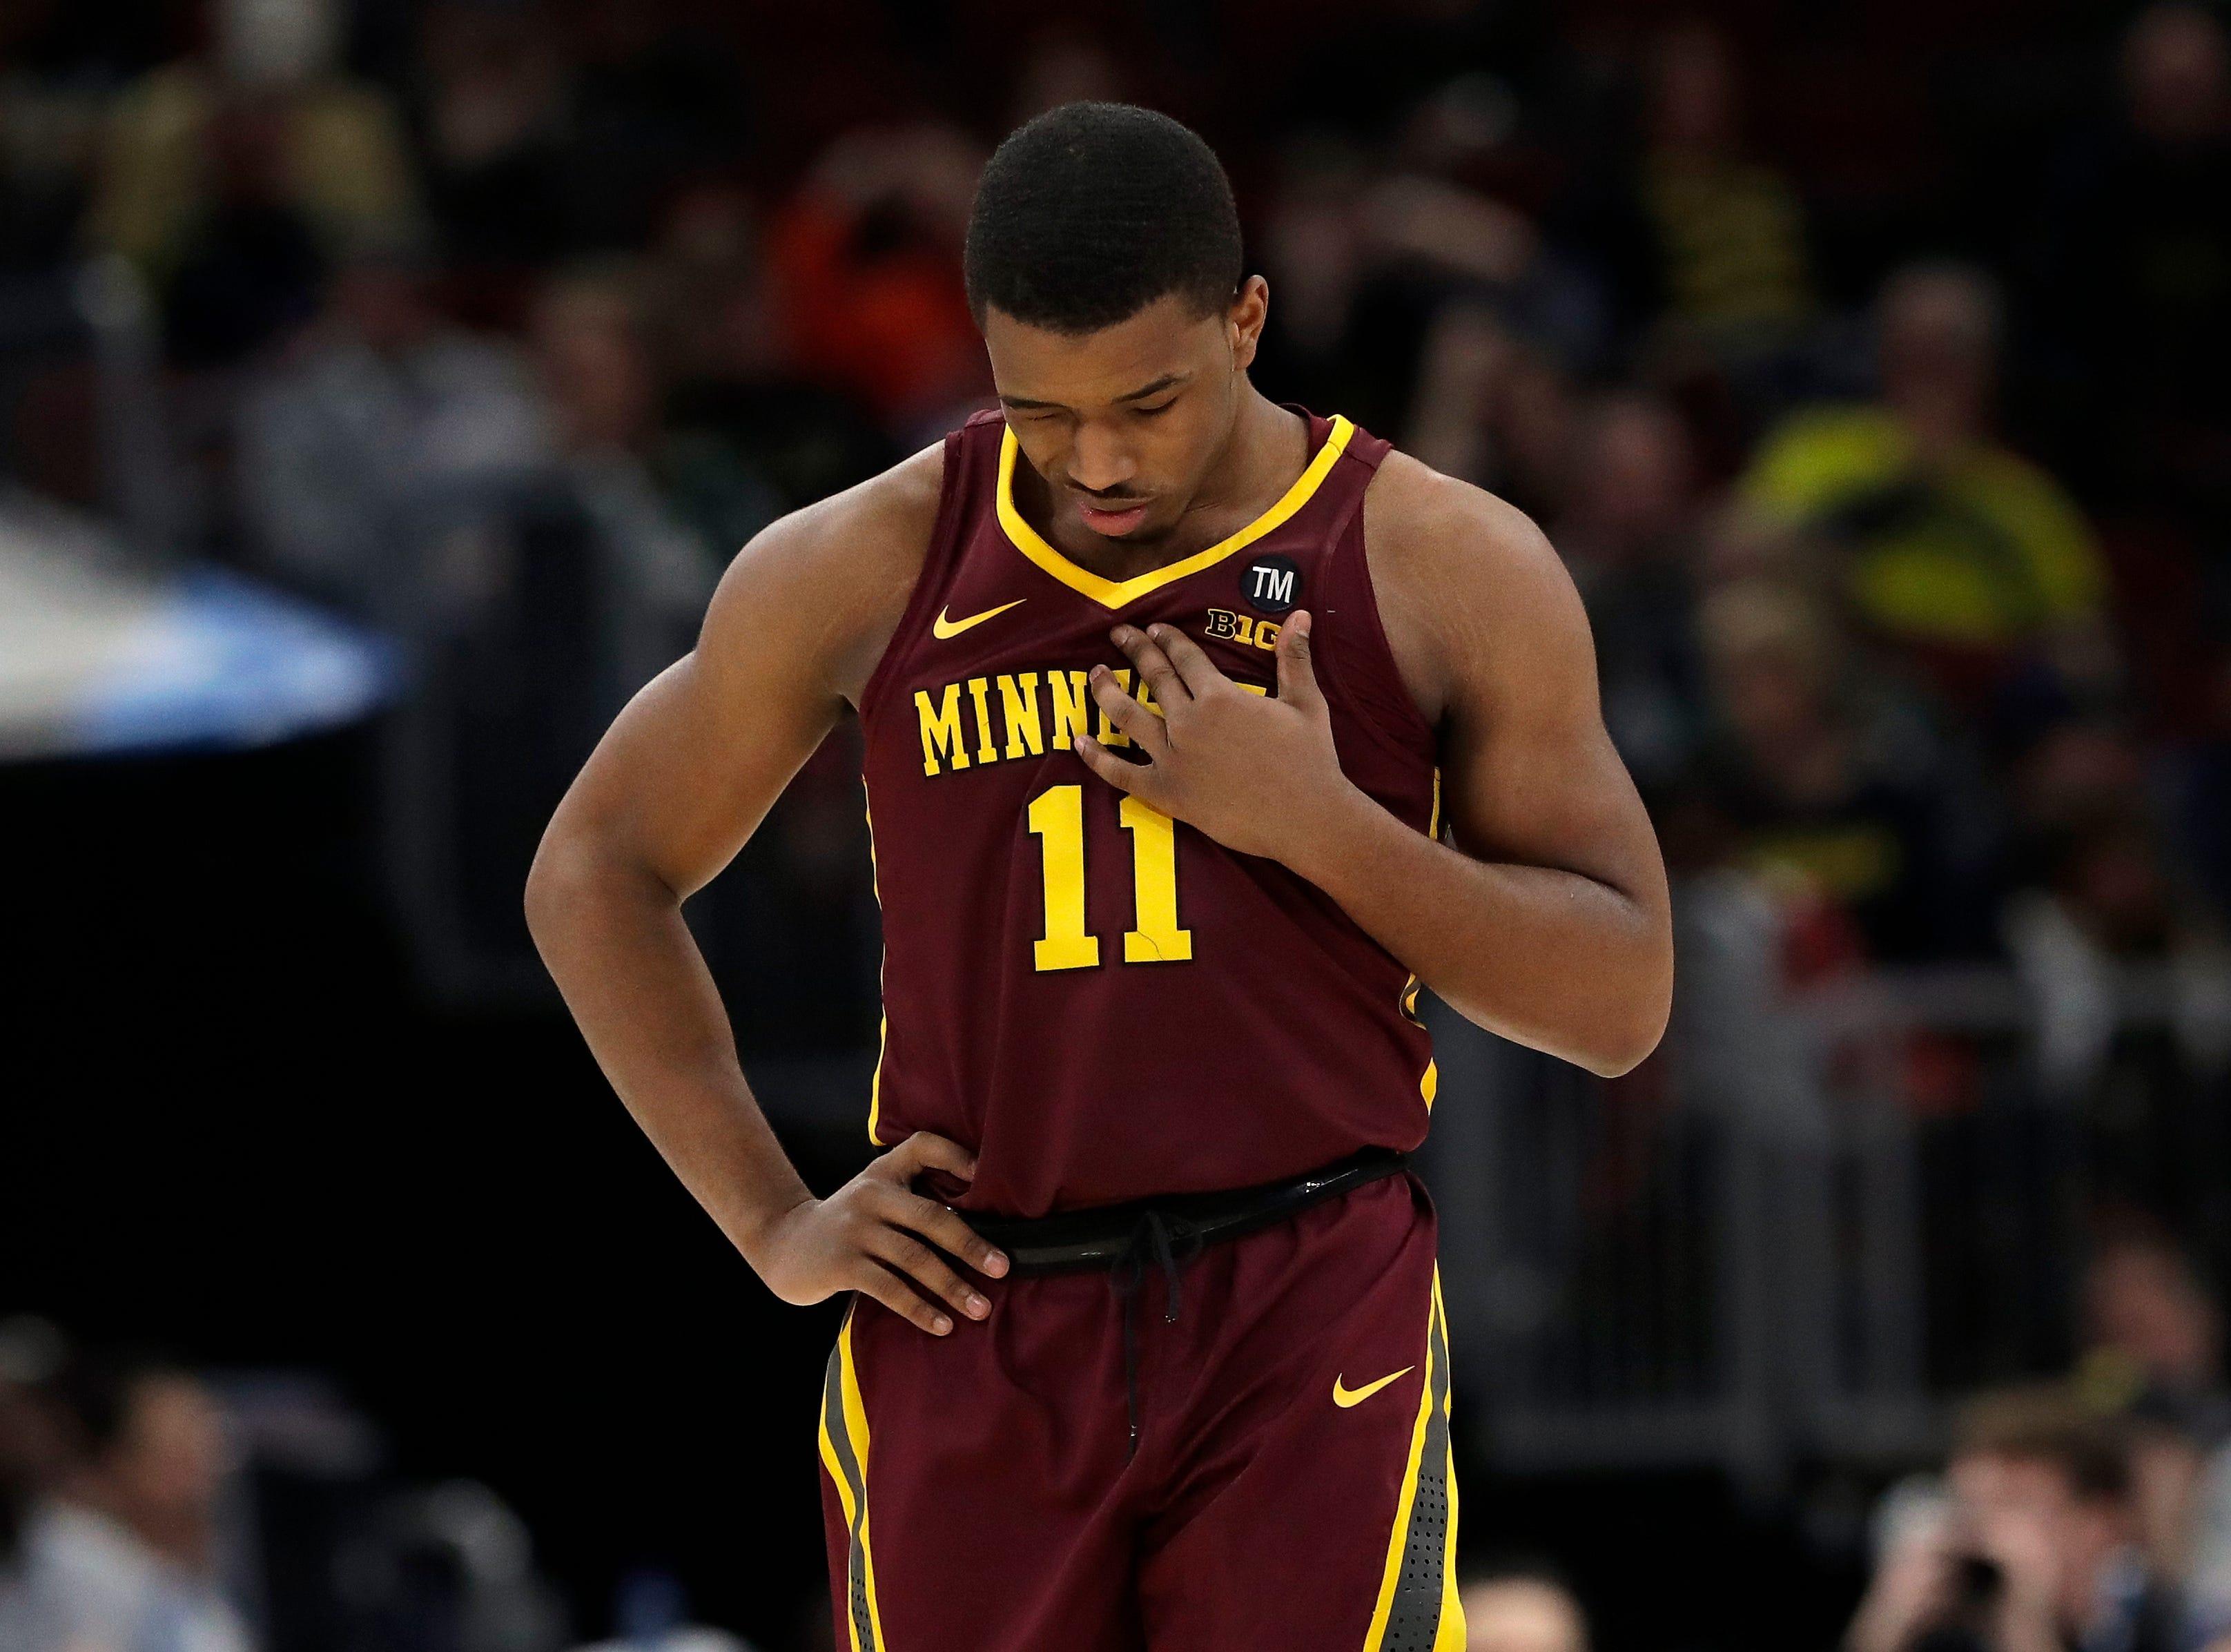 Minnesota's Isaiah Washington looks down during the second half.